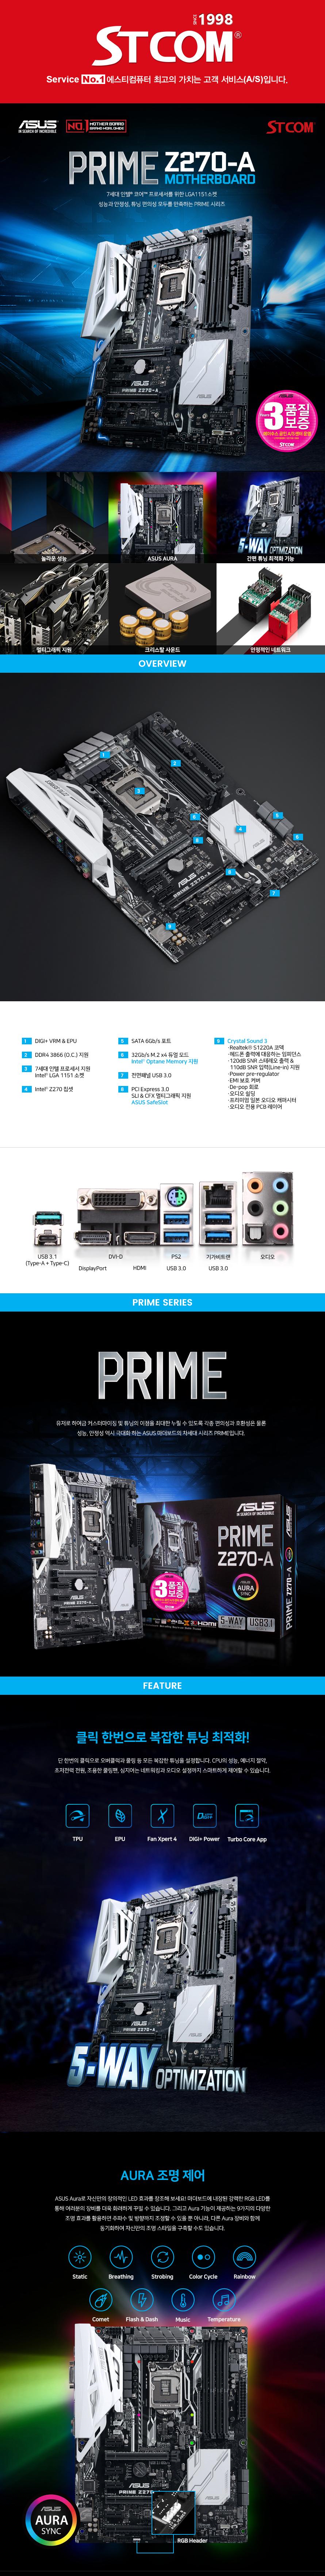 prime_z270a-a-st_01